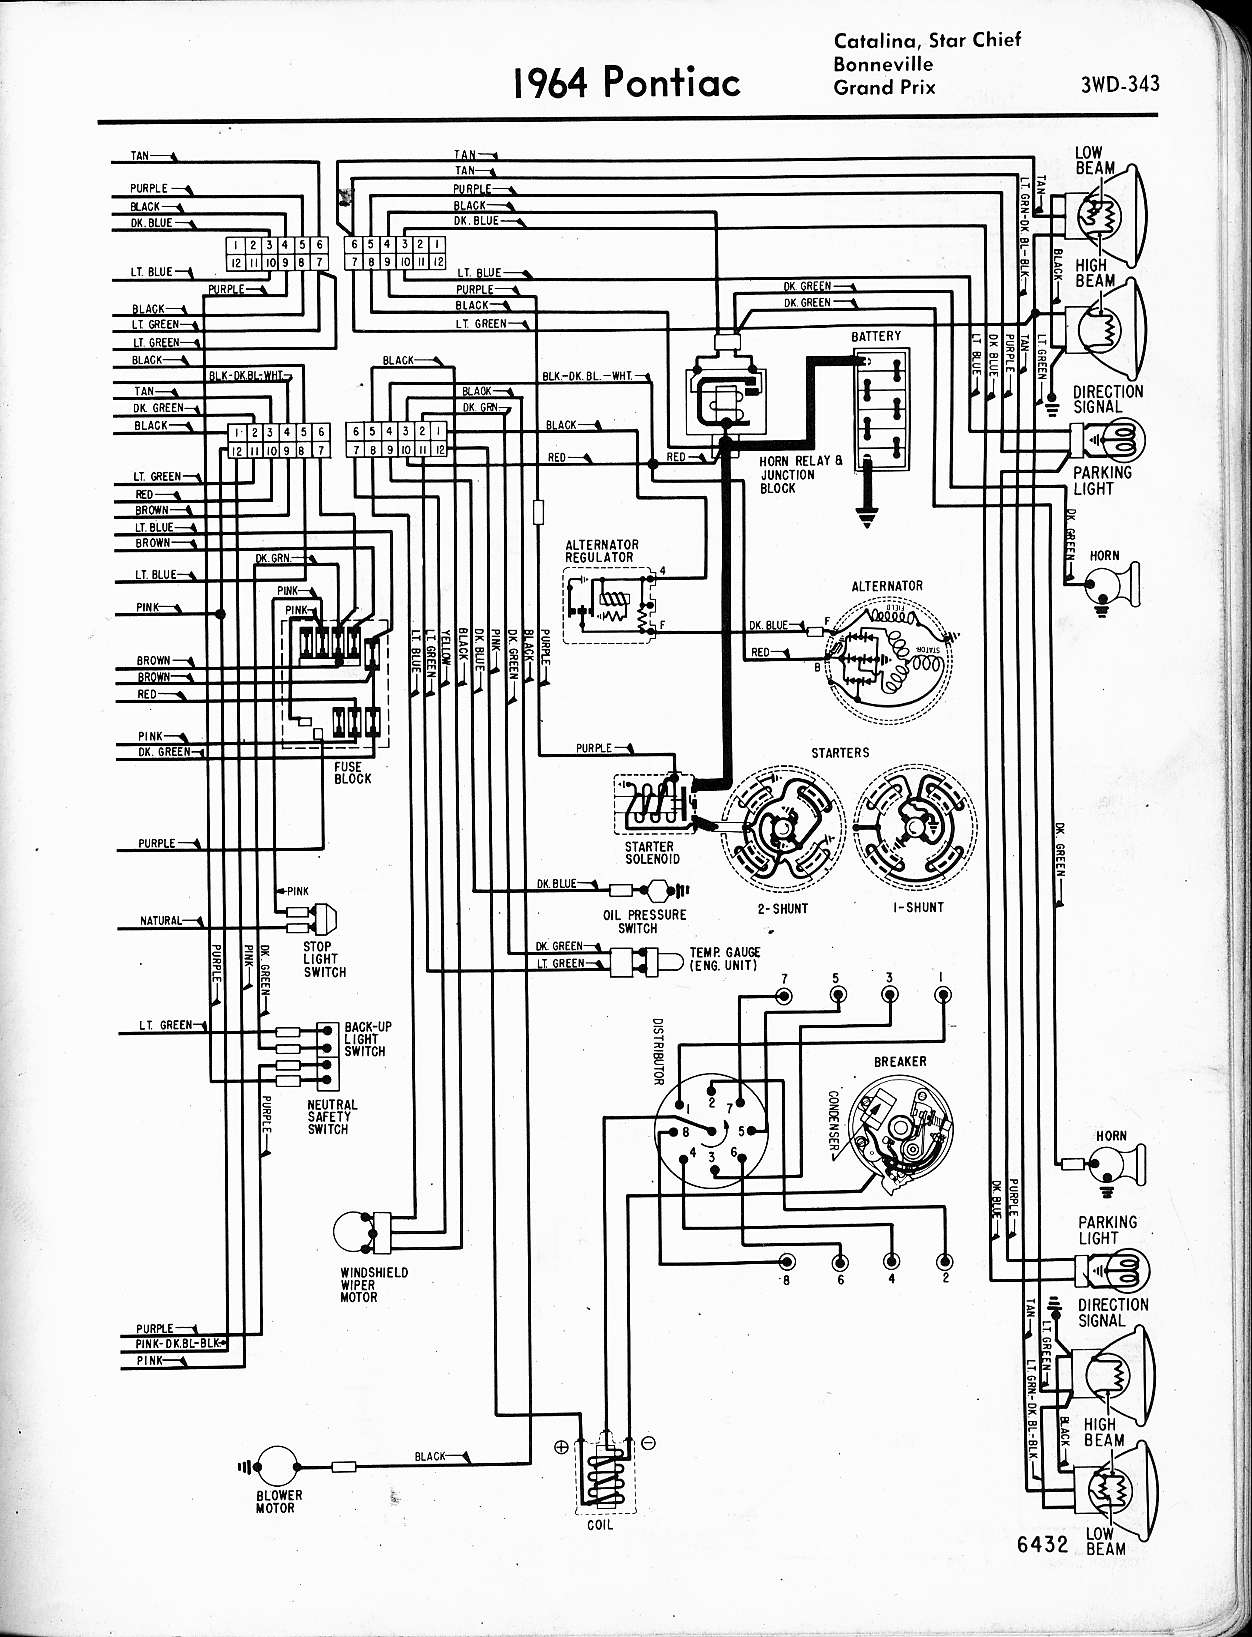 69 firebird wiring diagram 2005 jeep liberty trailer 1969 gto dash manual e books wallace racing diagrams1964 catalina star chief bonneville grand prix right page